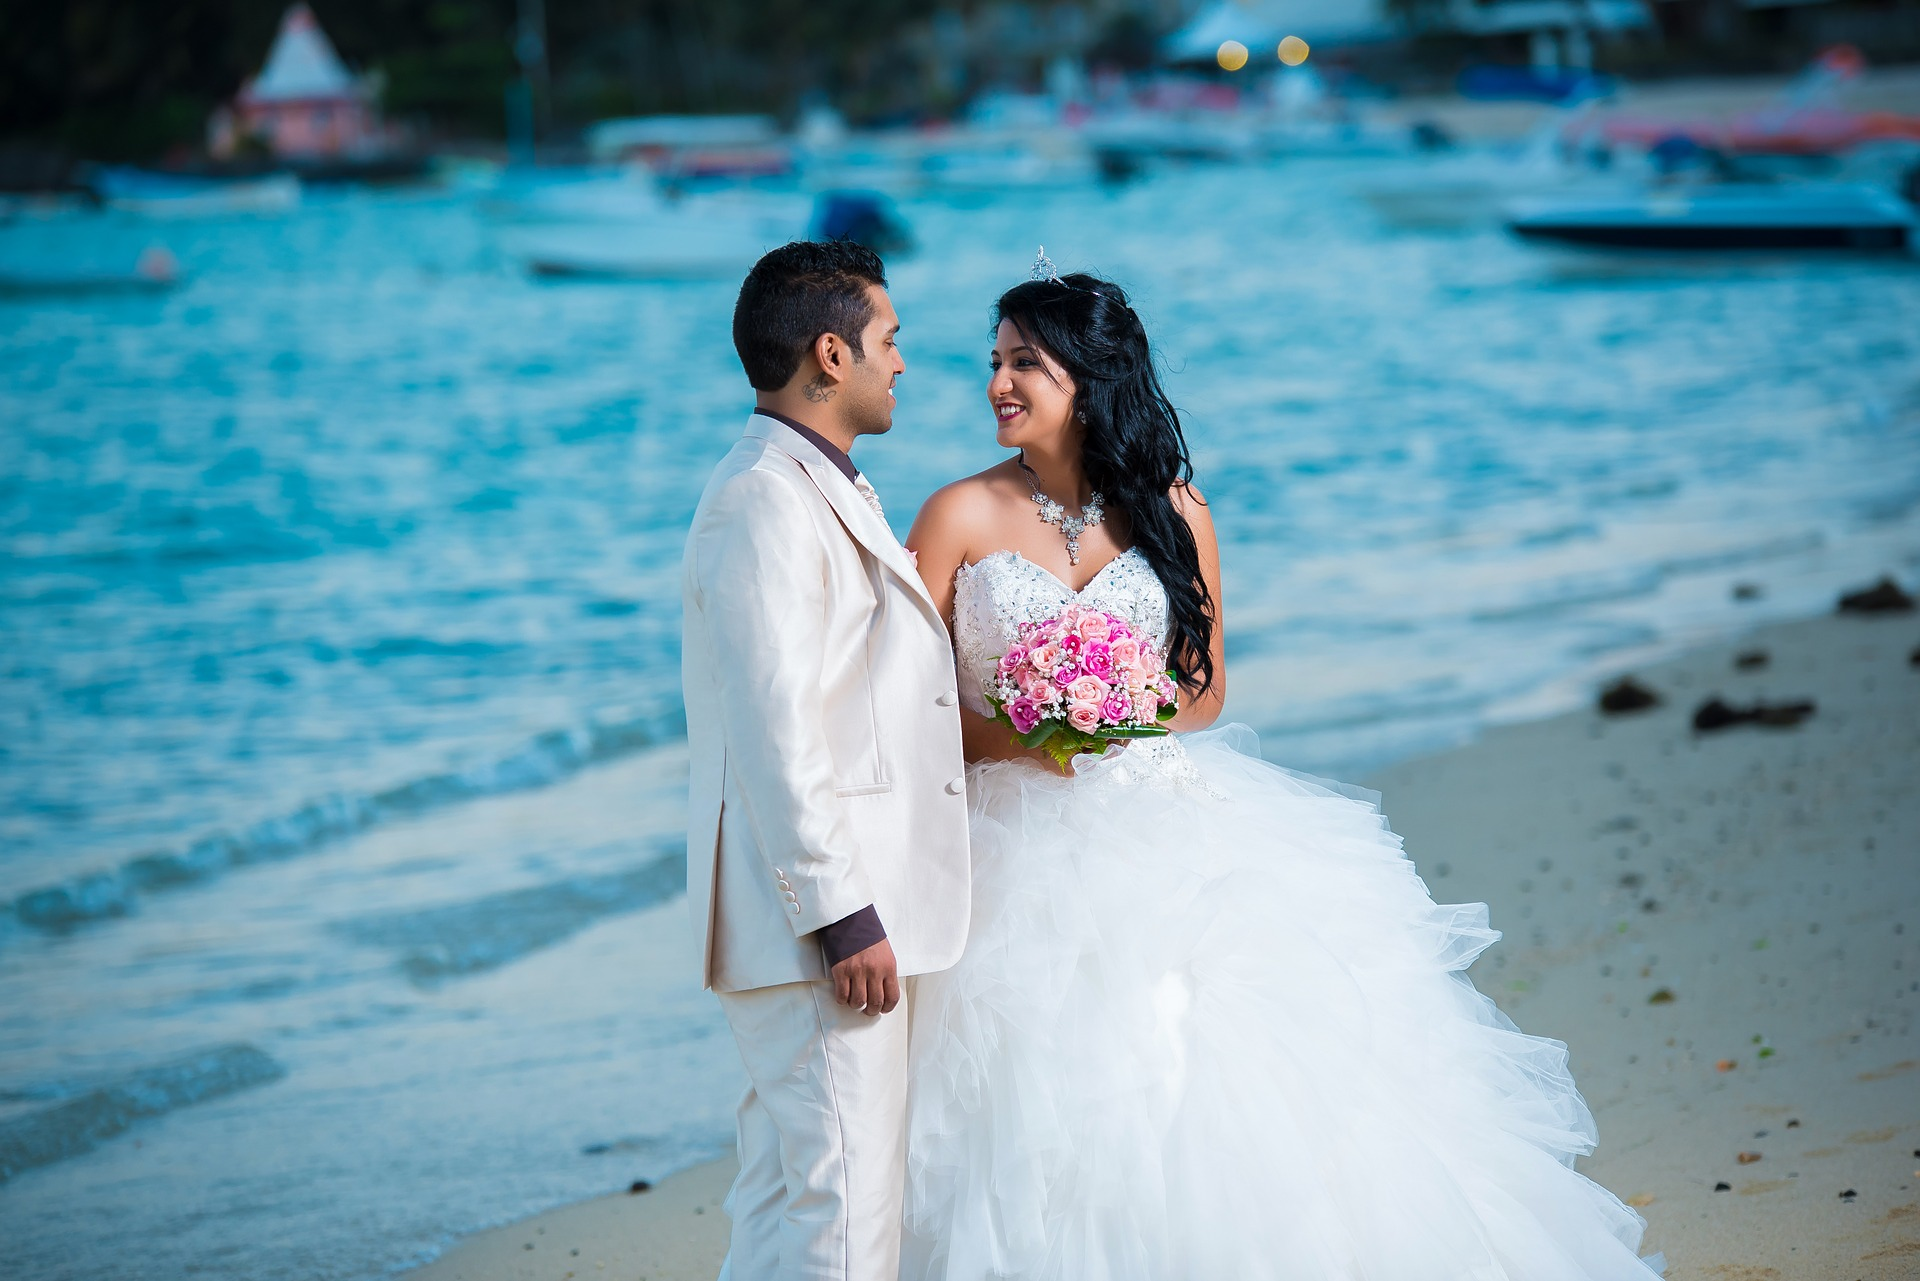 wedding-1235557_1920